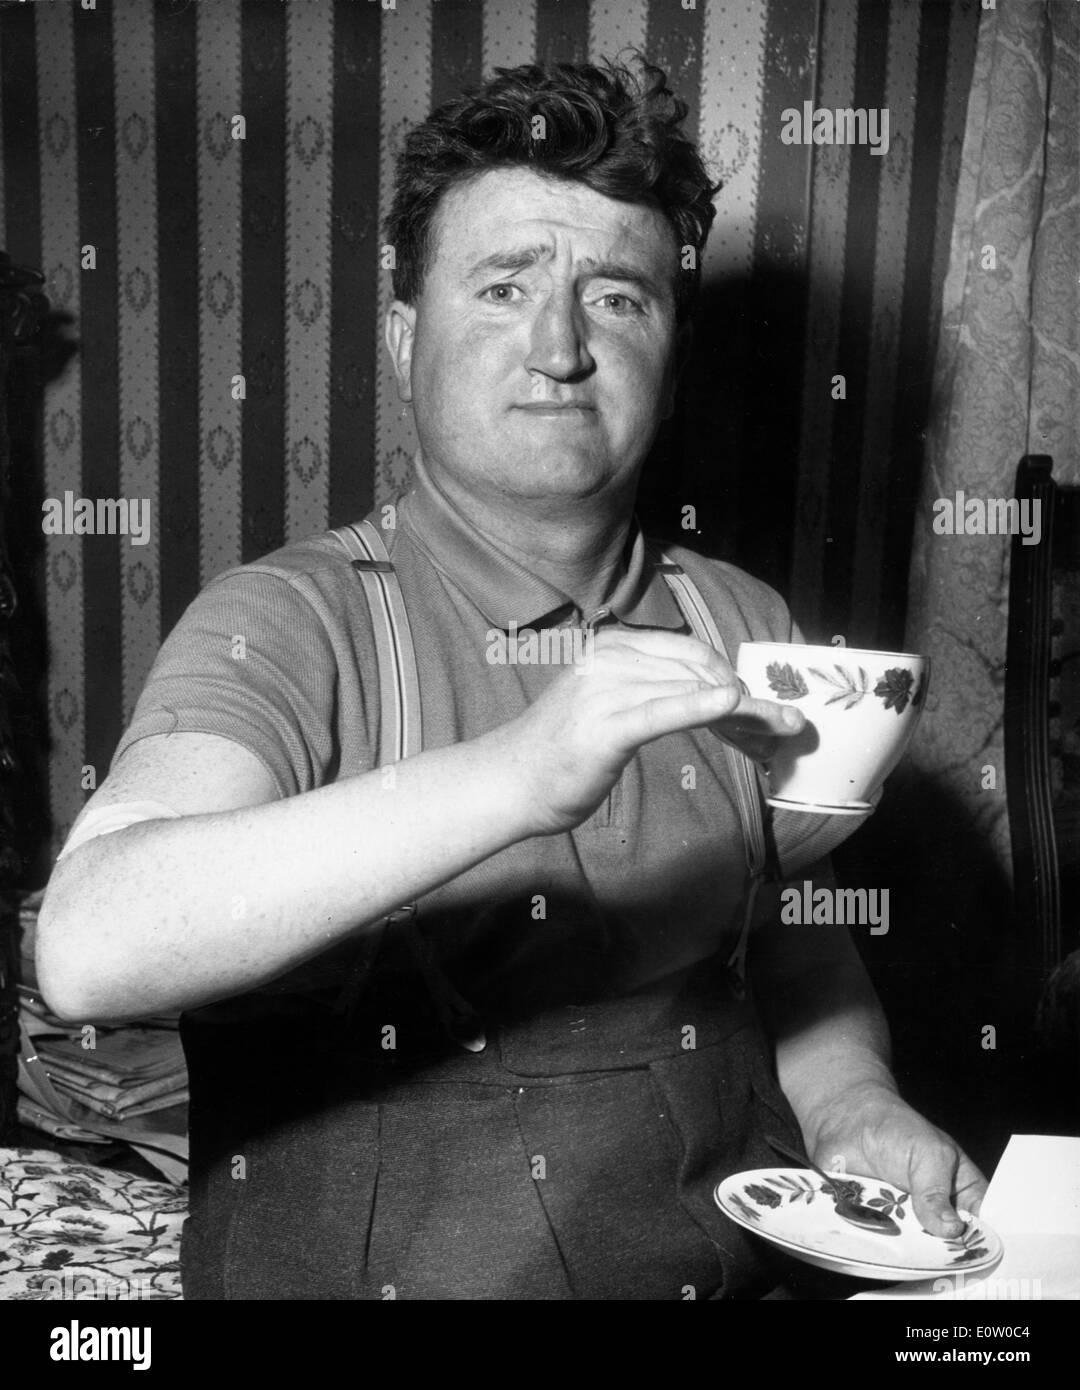 Irish writer Brendan Behan having a cup of tea - Stock Image